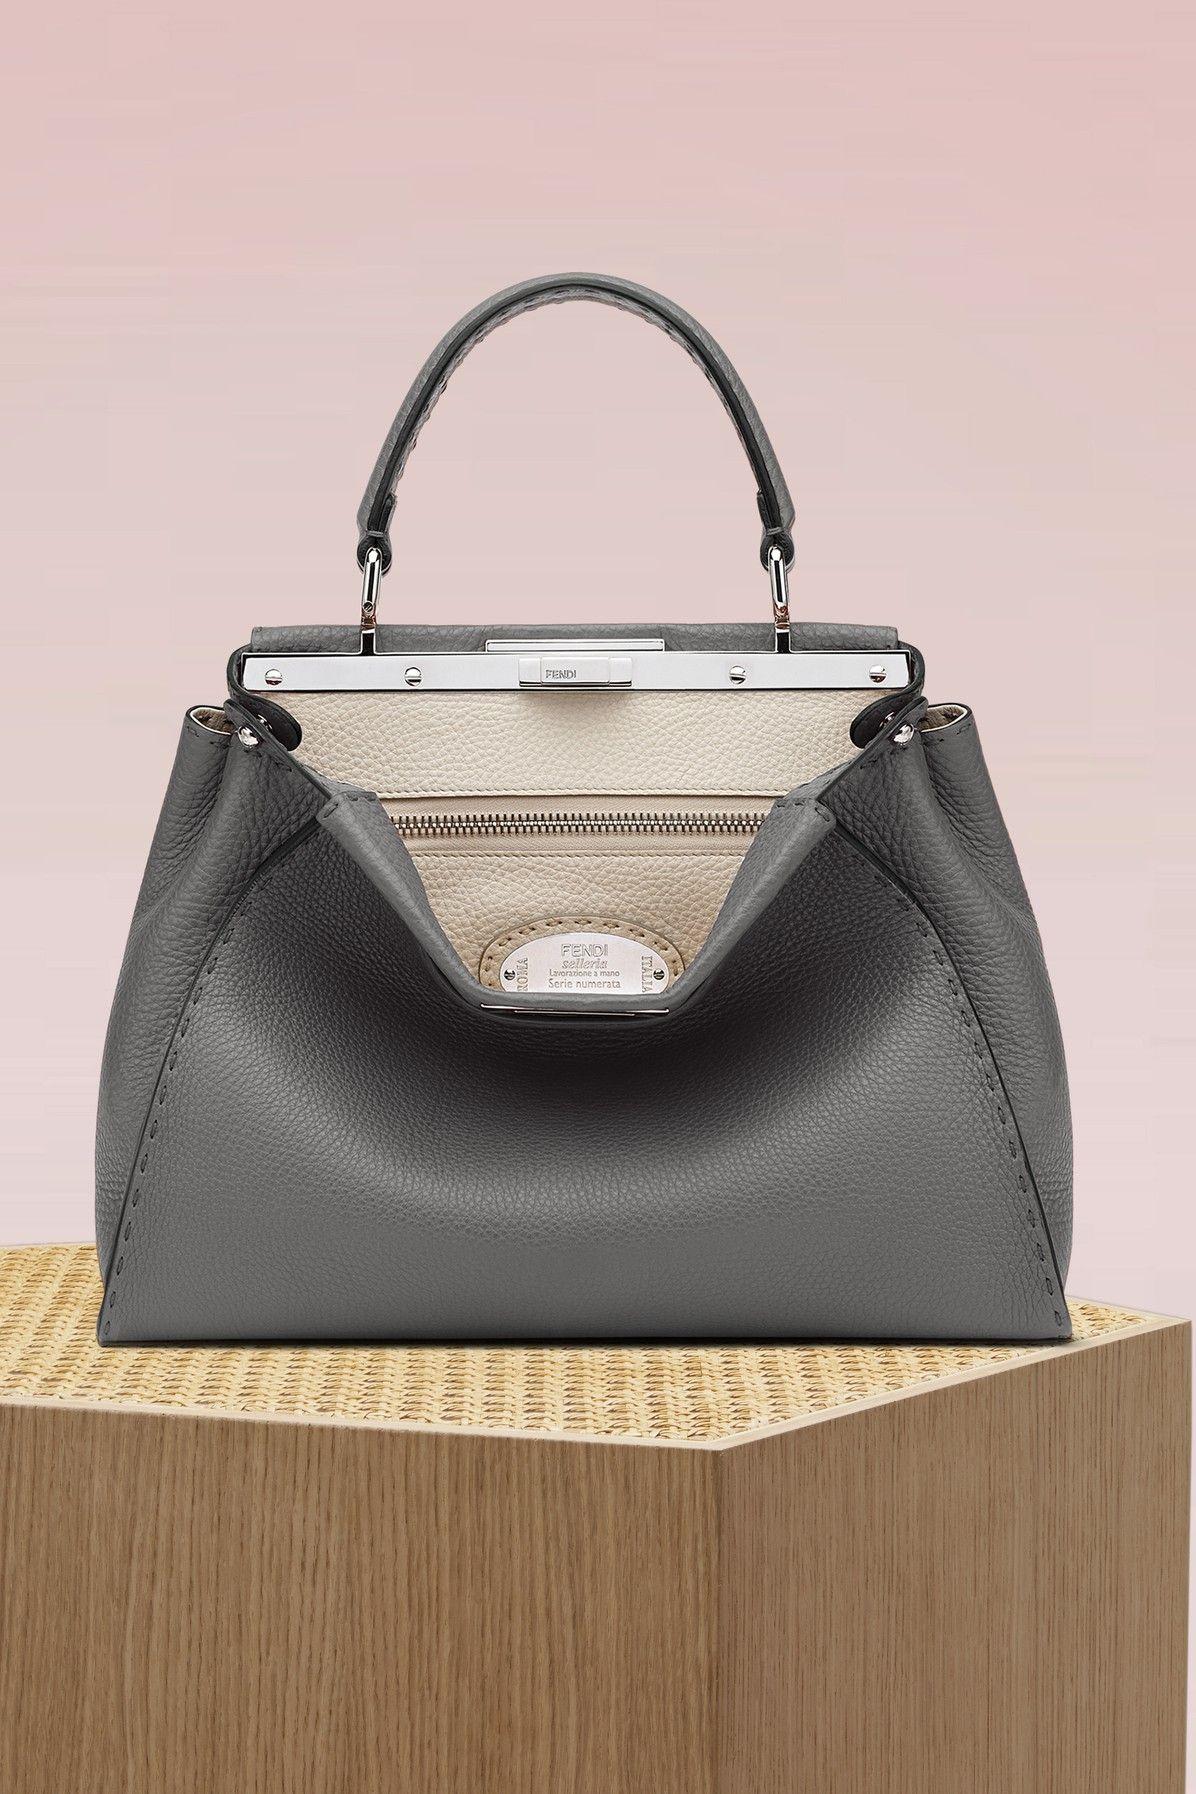 51c1aab138fd FENDI SELLERIA PEEKABOO HANDBAG.  fendi  bags  shoulder bags  hand bags   denim  leather